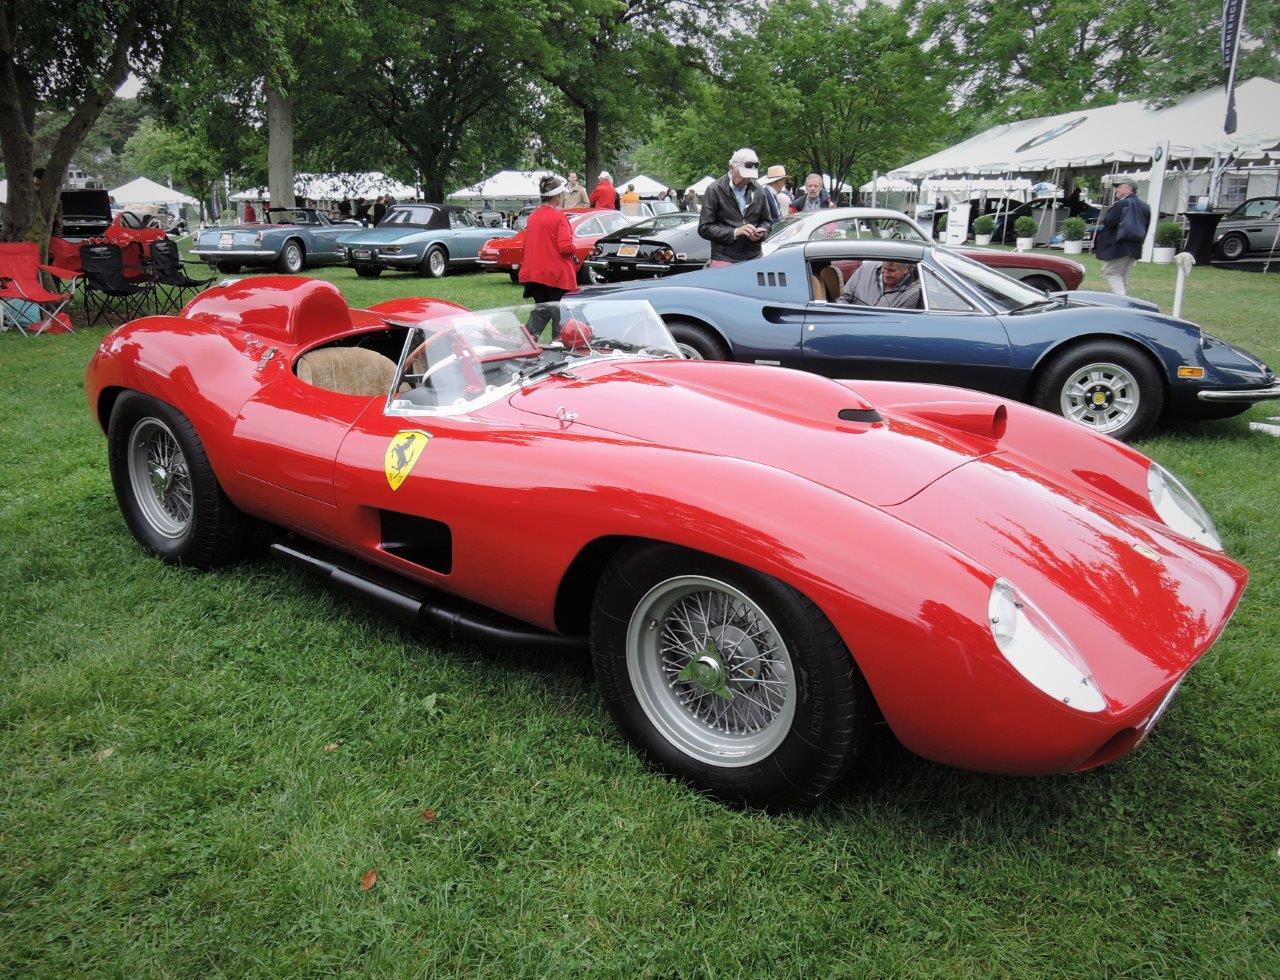 red 1957 Ferrari 335 Sport Spider Scaglietti - 2018 Greenwich Concours International